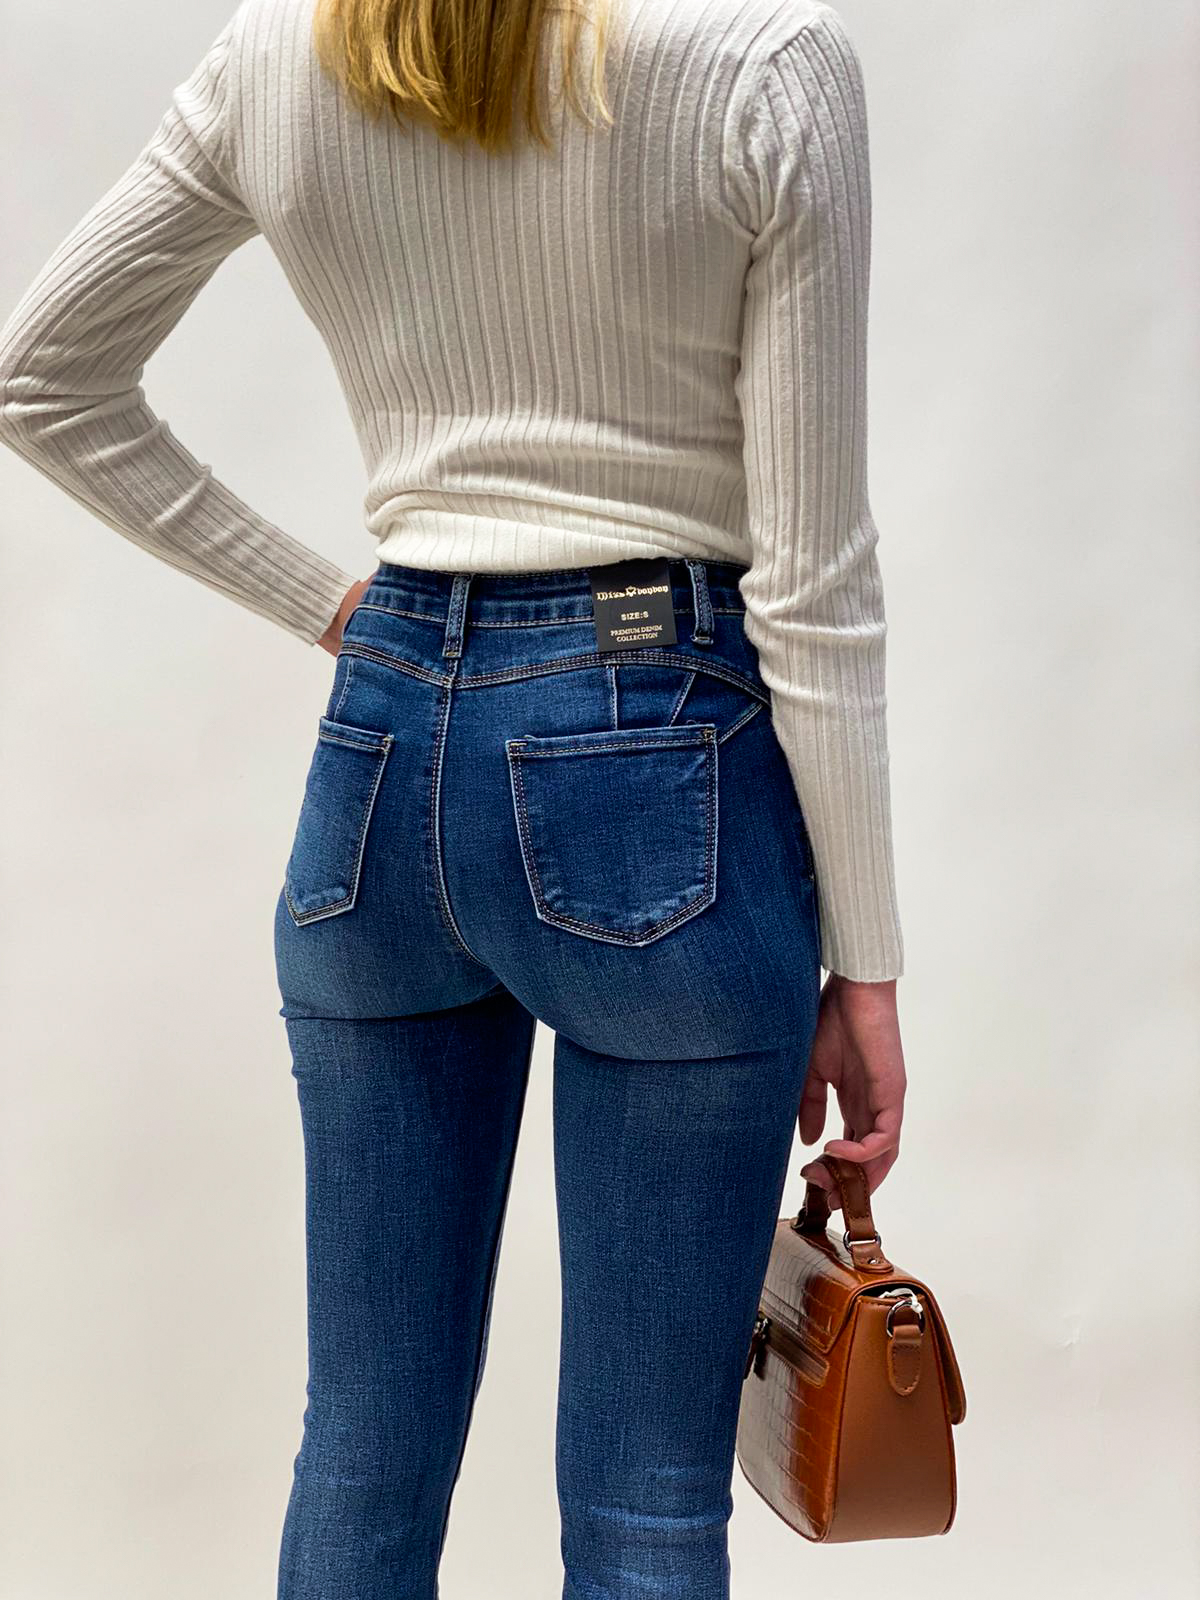 Jeans Schlaghose